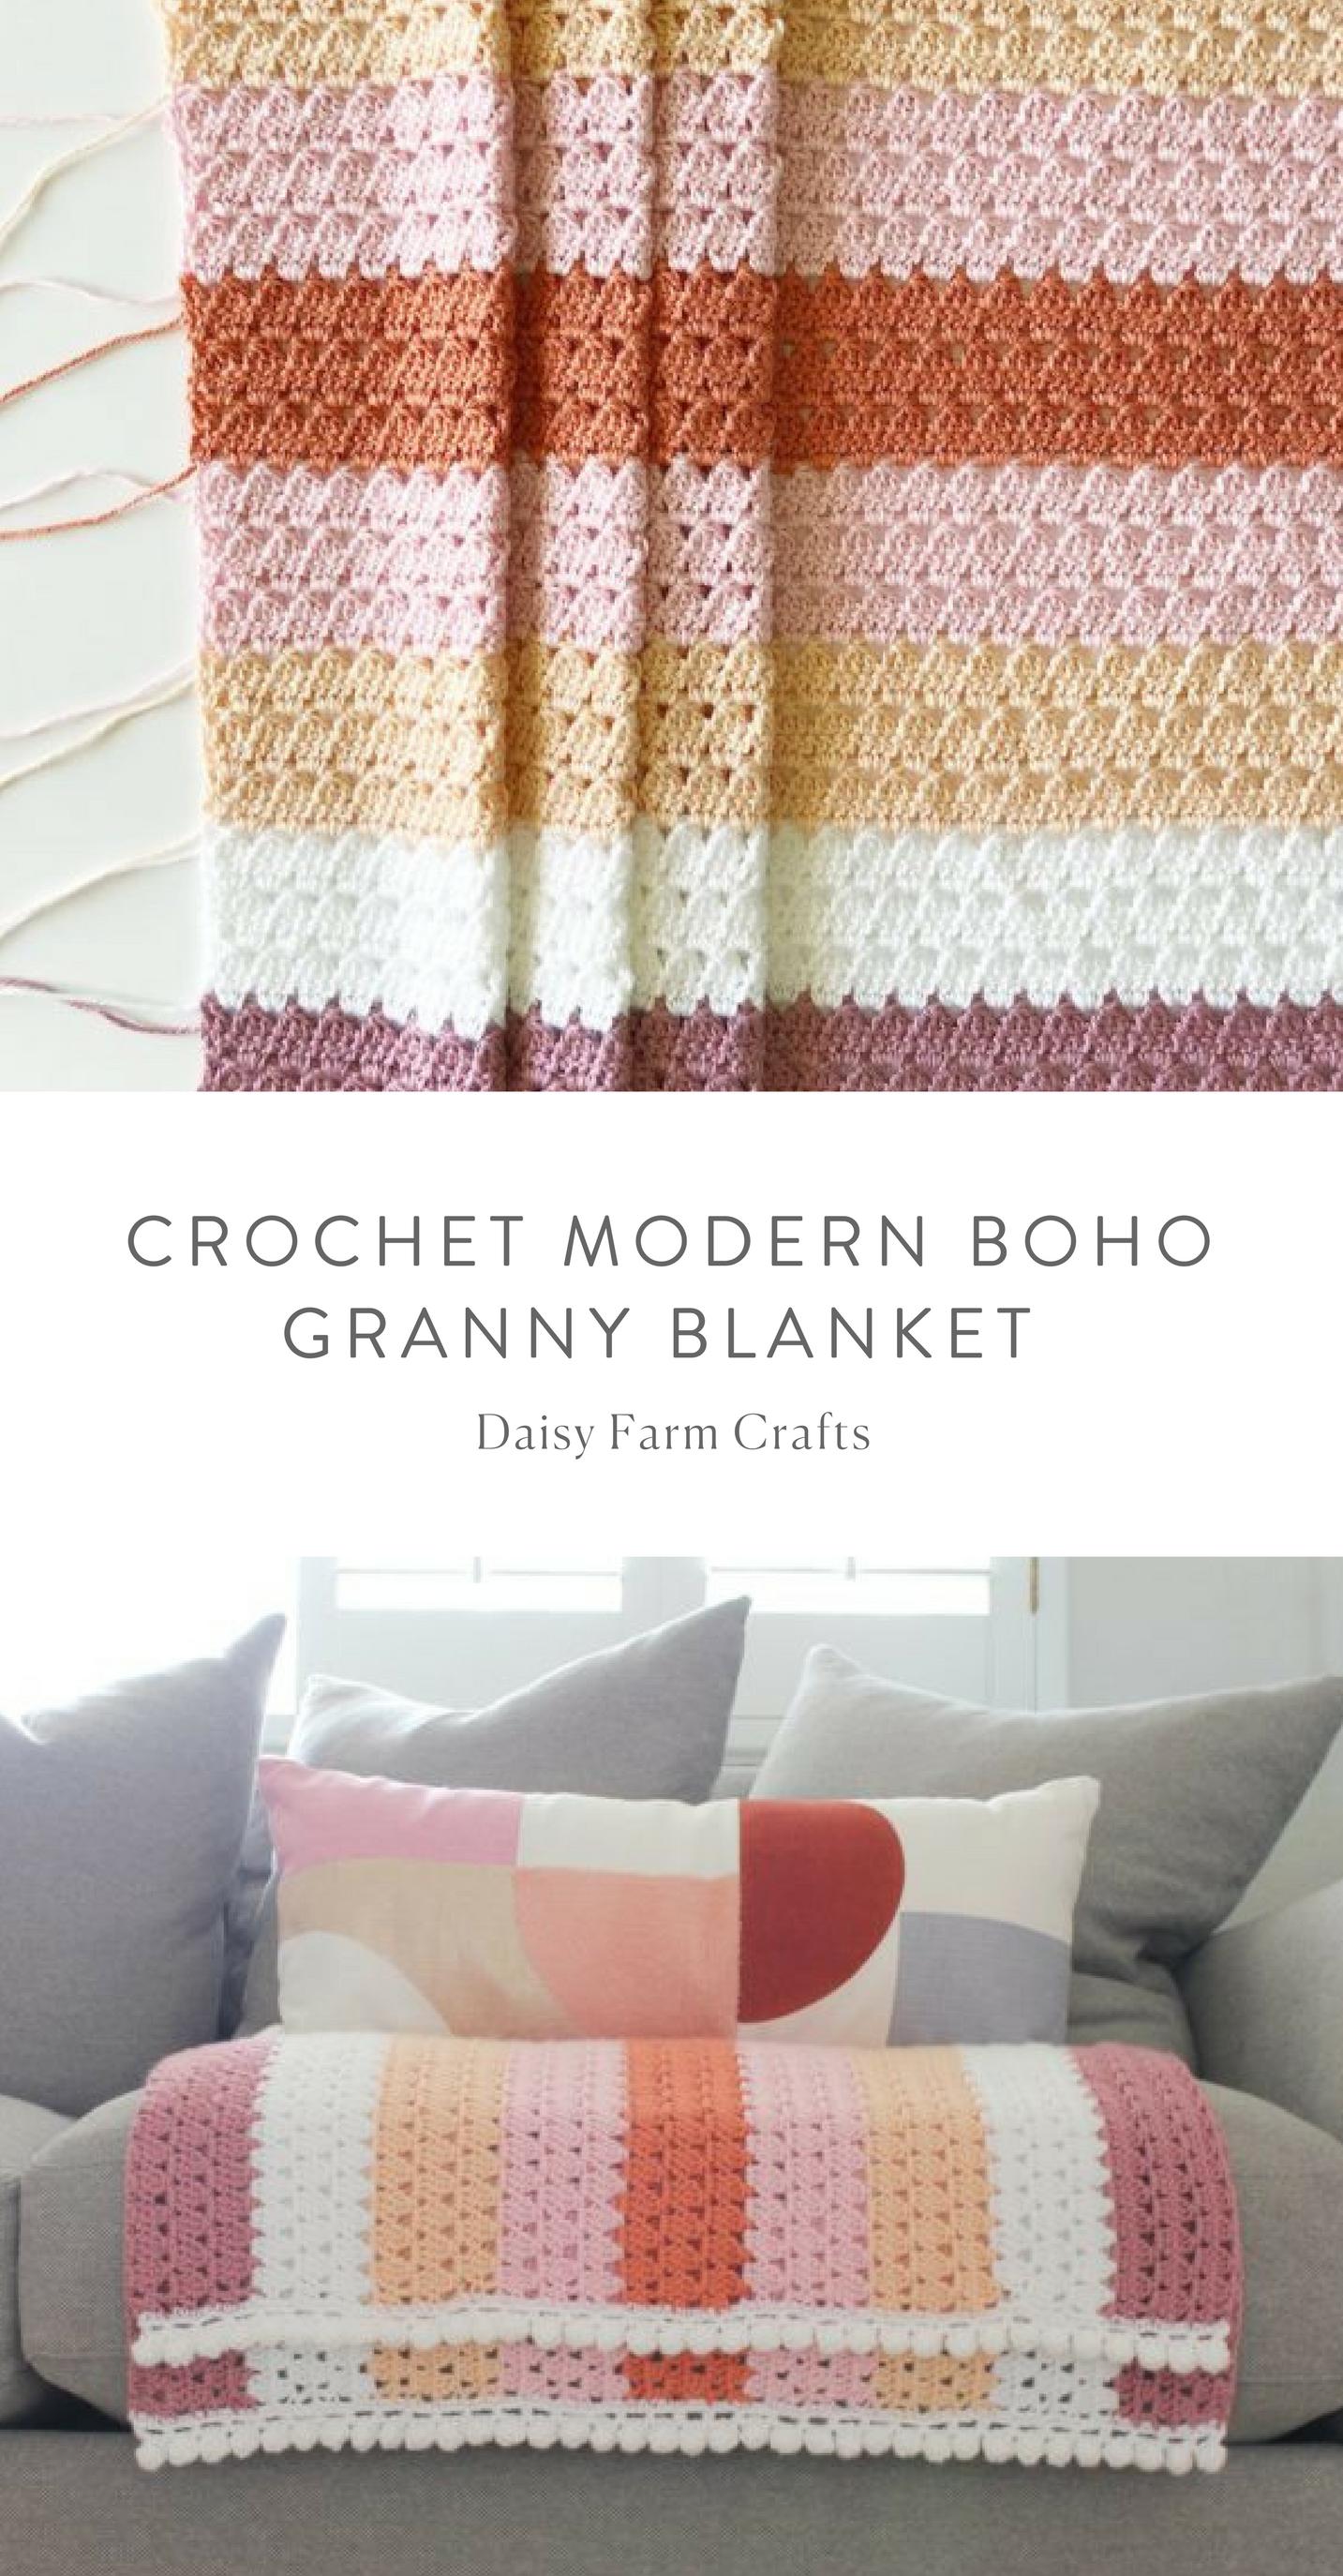 Free Pattern - Crochet Modern Boho Granny Blanket - Daisy Farm ...